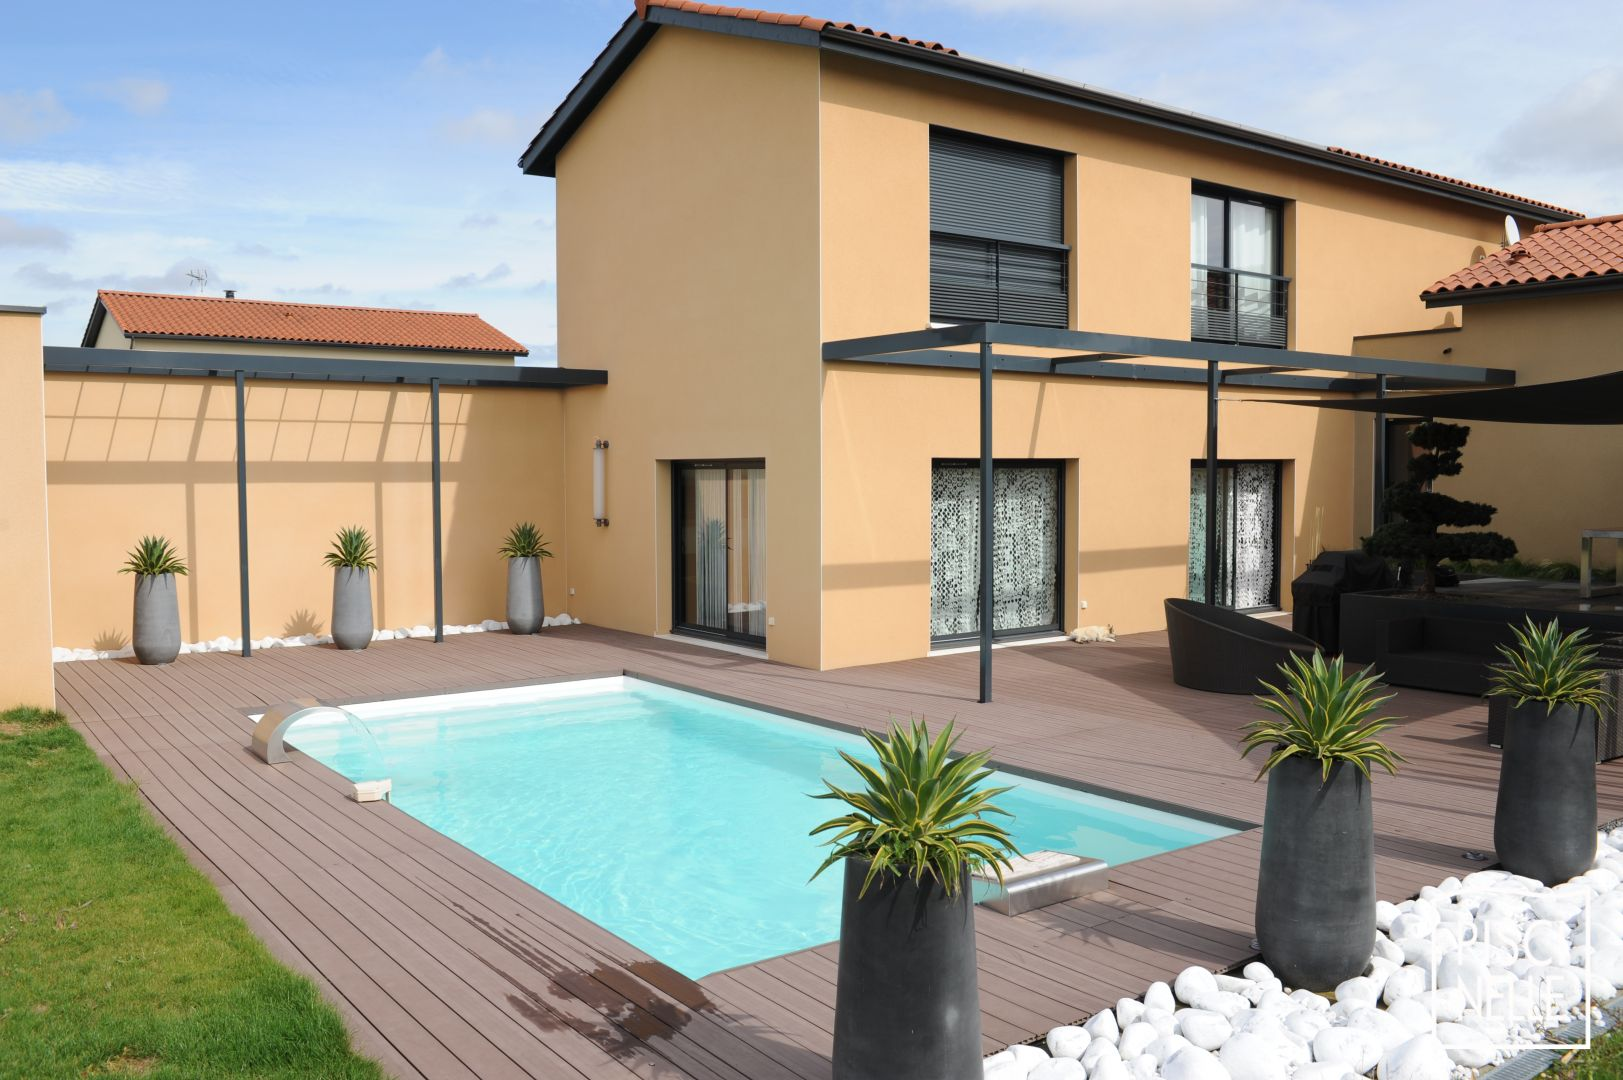 photos de piscines piscine piscinelle. Black Bedroom Furniture Sets. Home Design Ideas